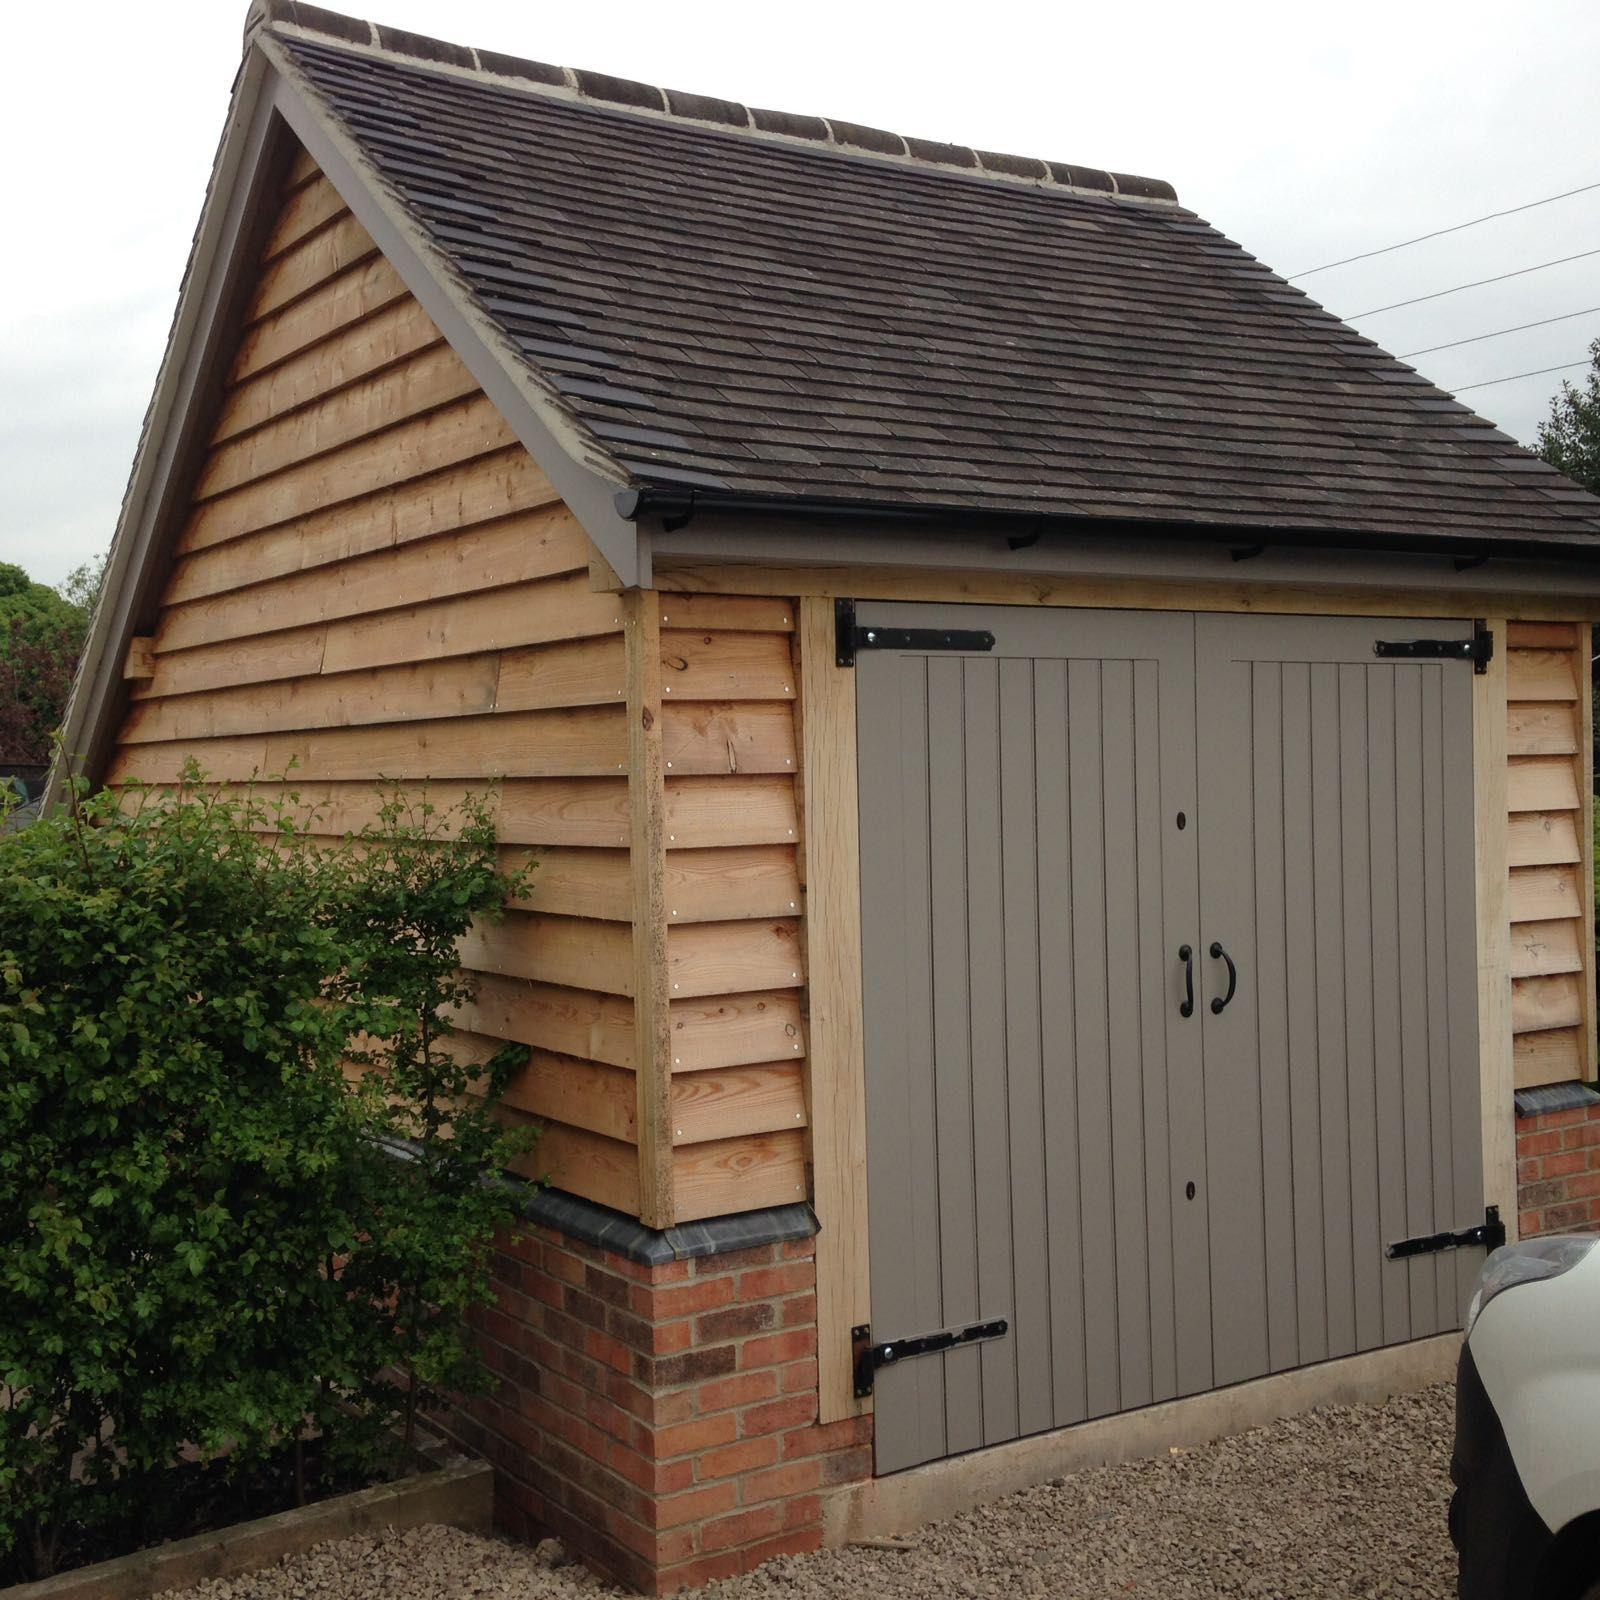 Oak Frame Garage Larch Cladding And Brick Plinths